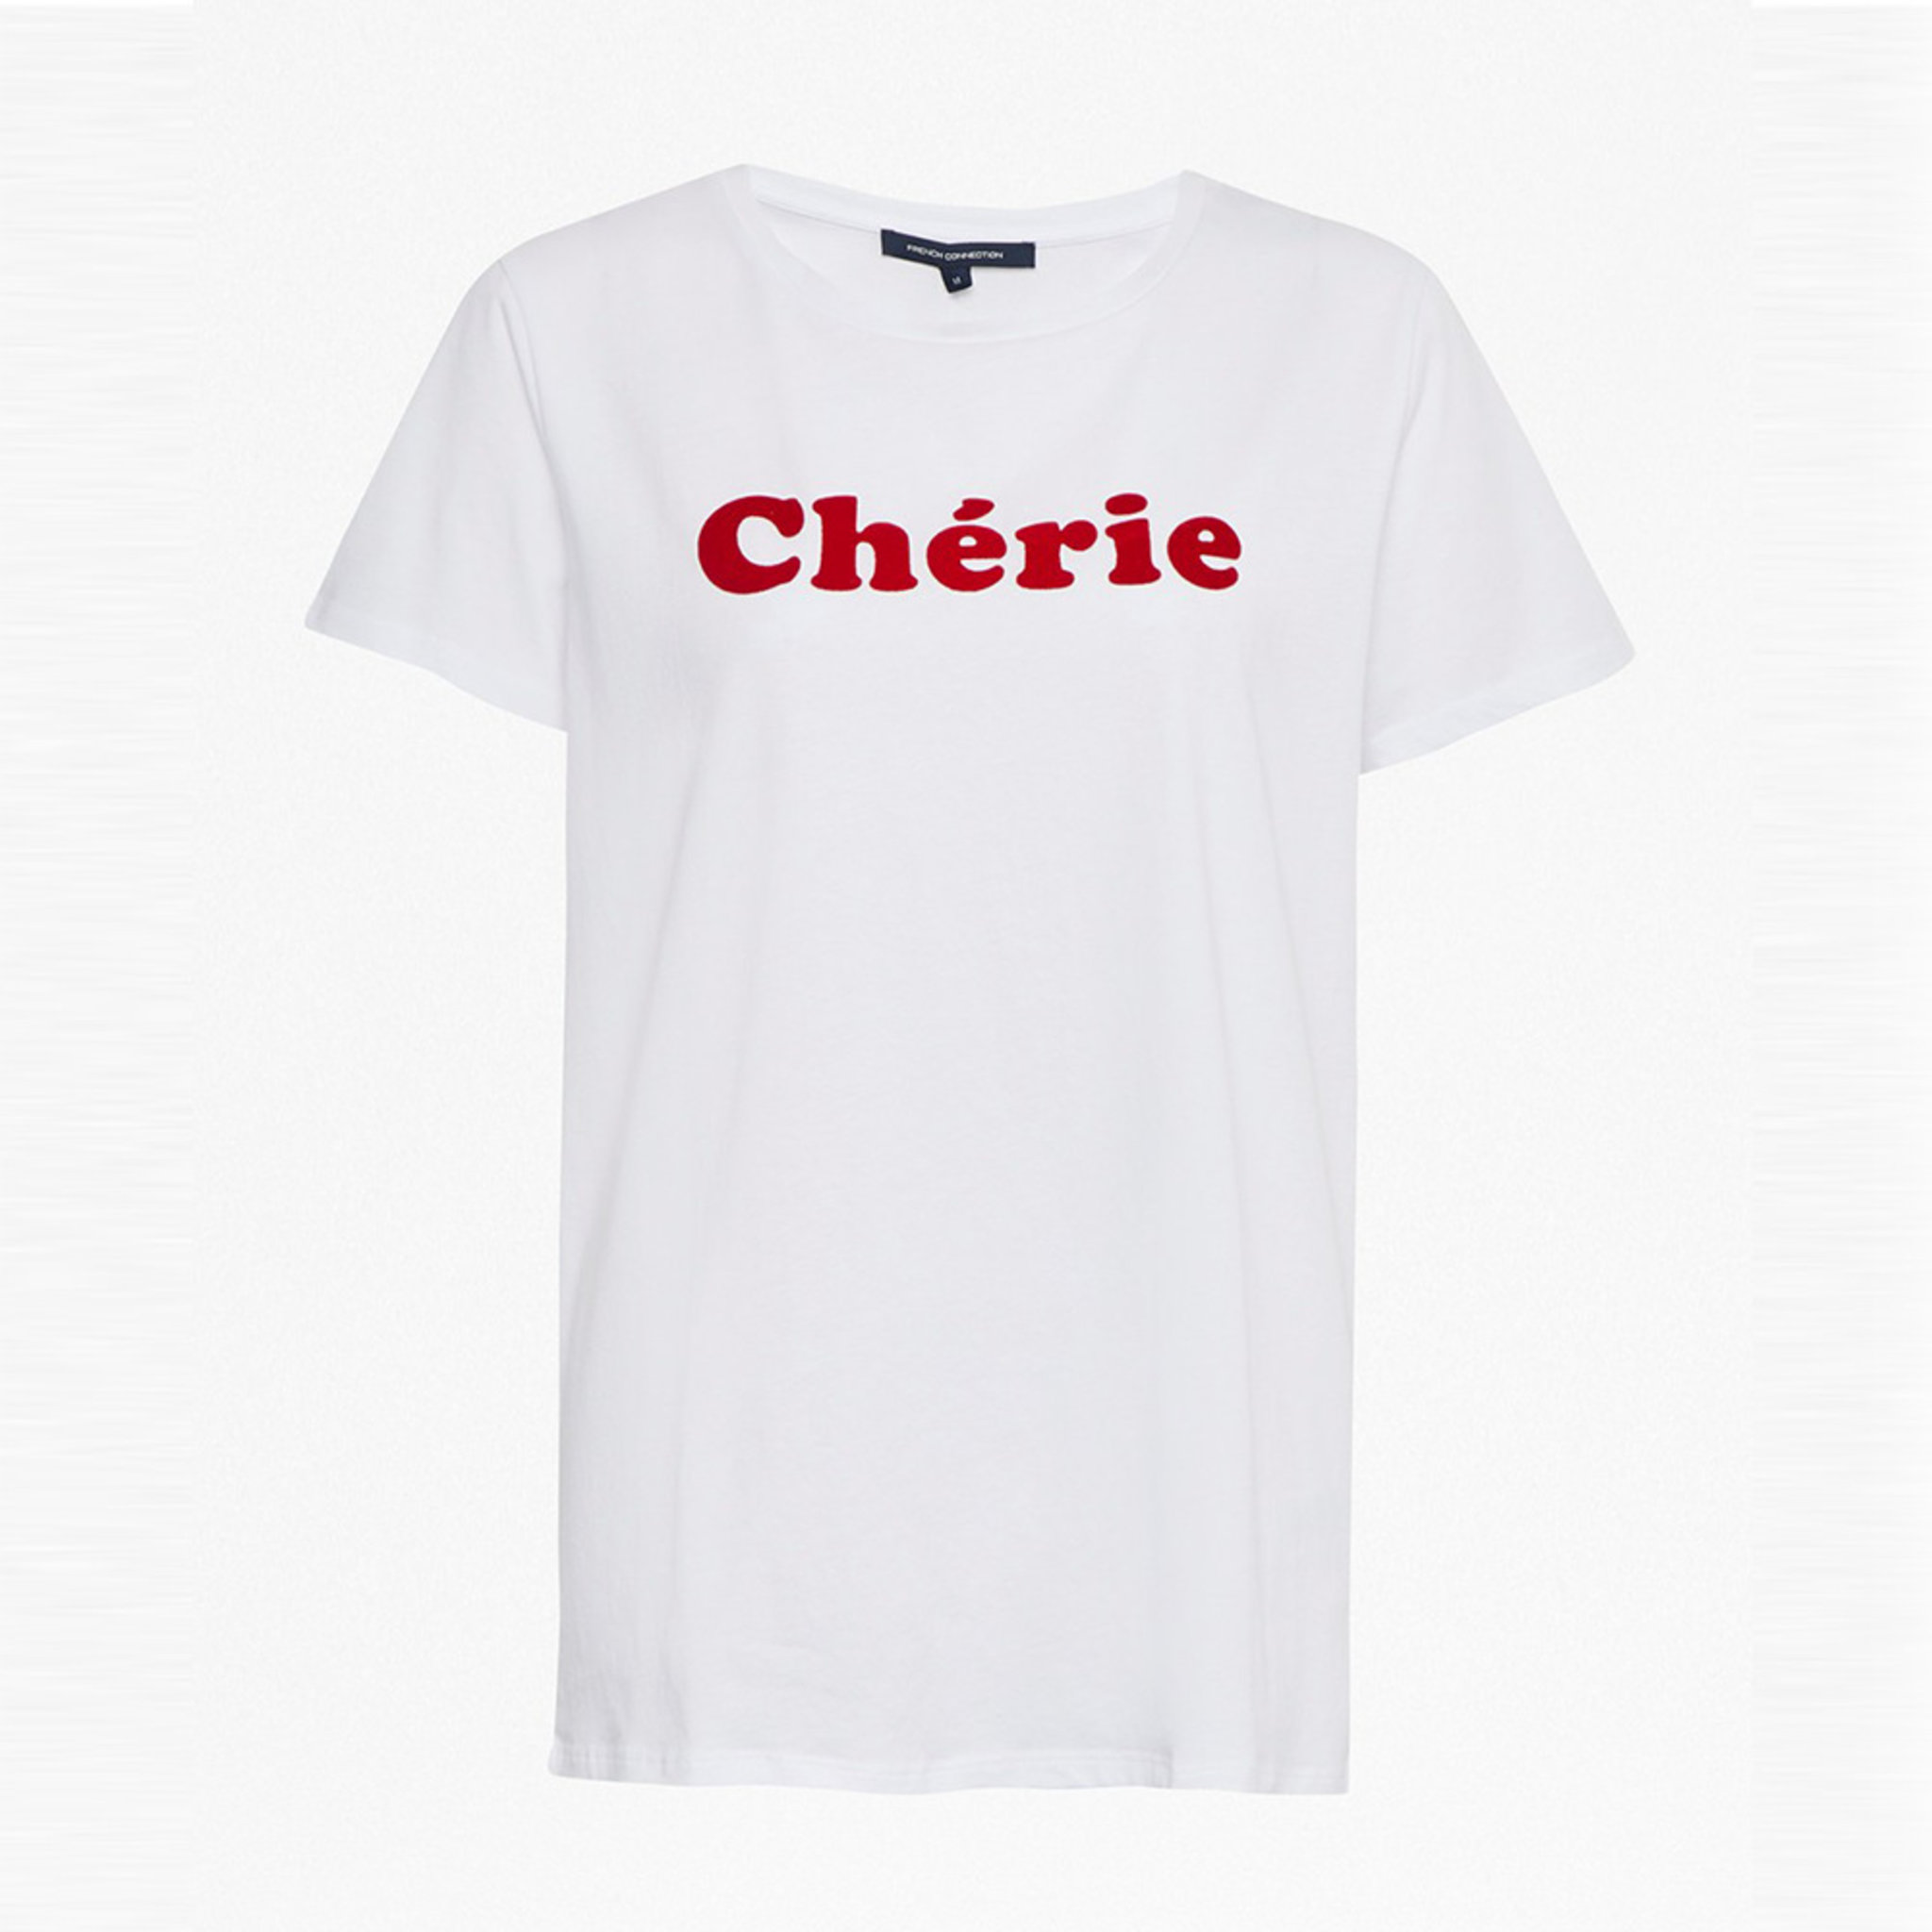 a700c7a55df Cherie Tee - T-shirts & toppar - Köp online på åhlens.se!